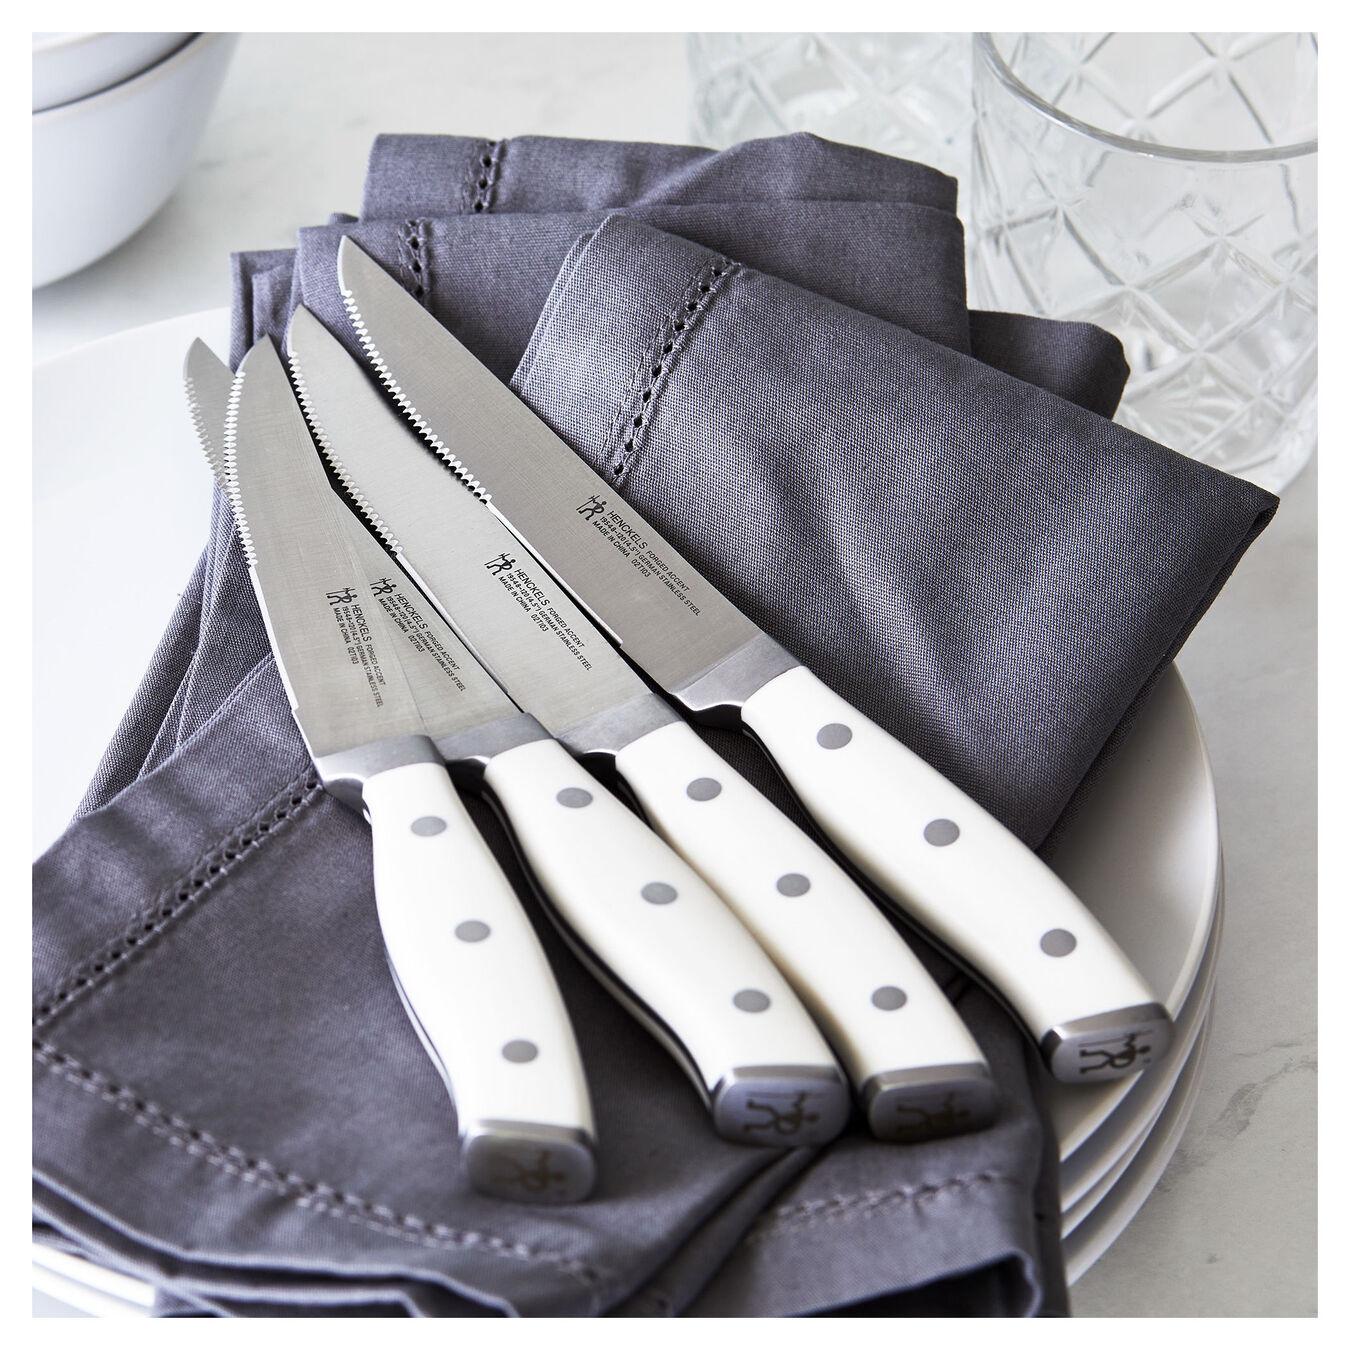 4-pc, Steak Knife Set - White,,large 2